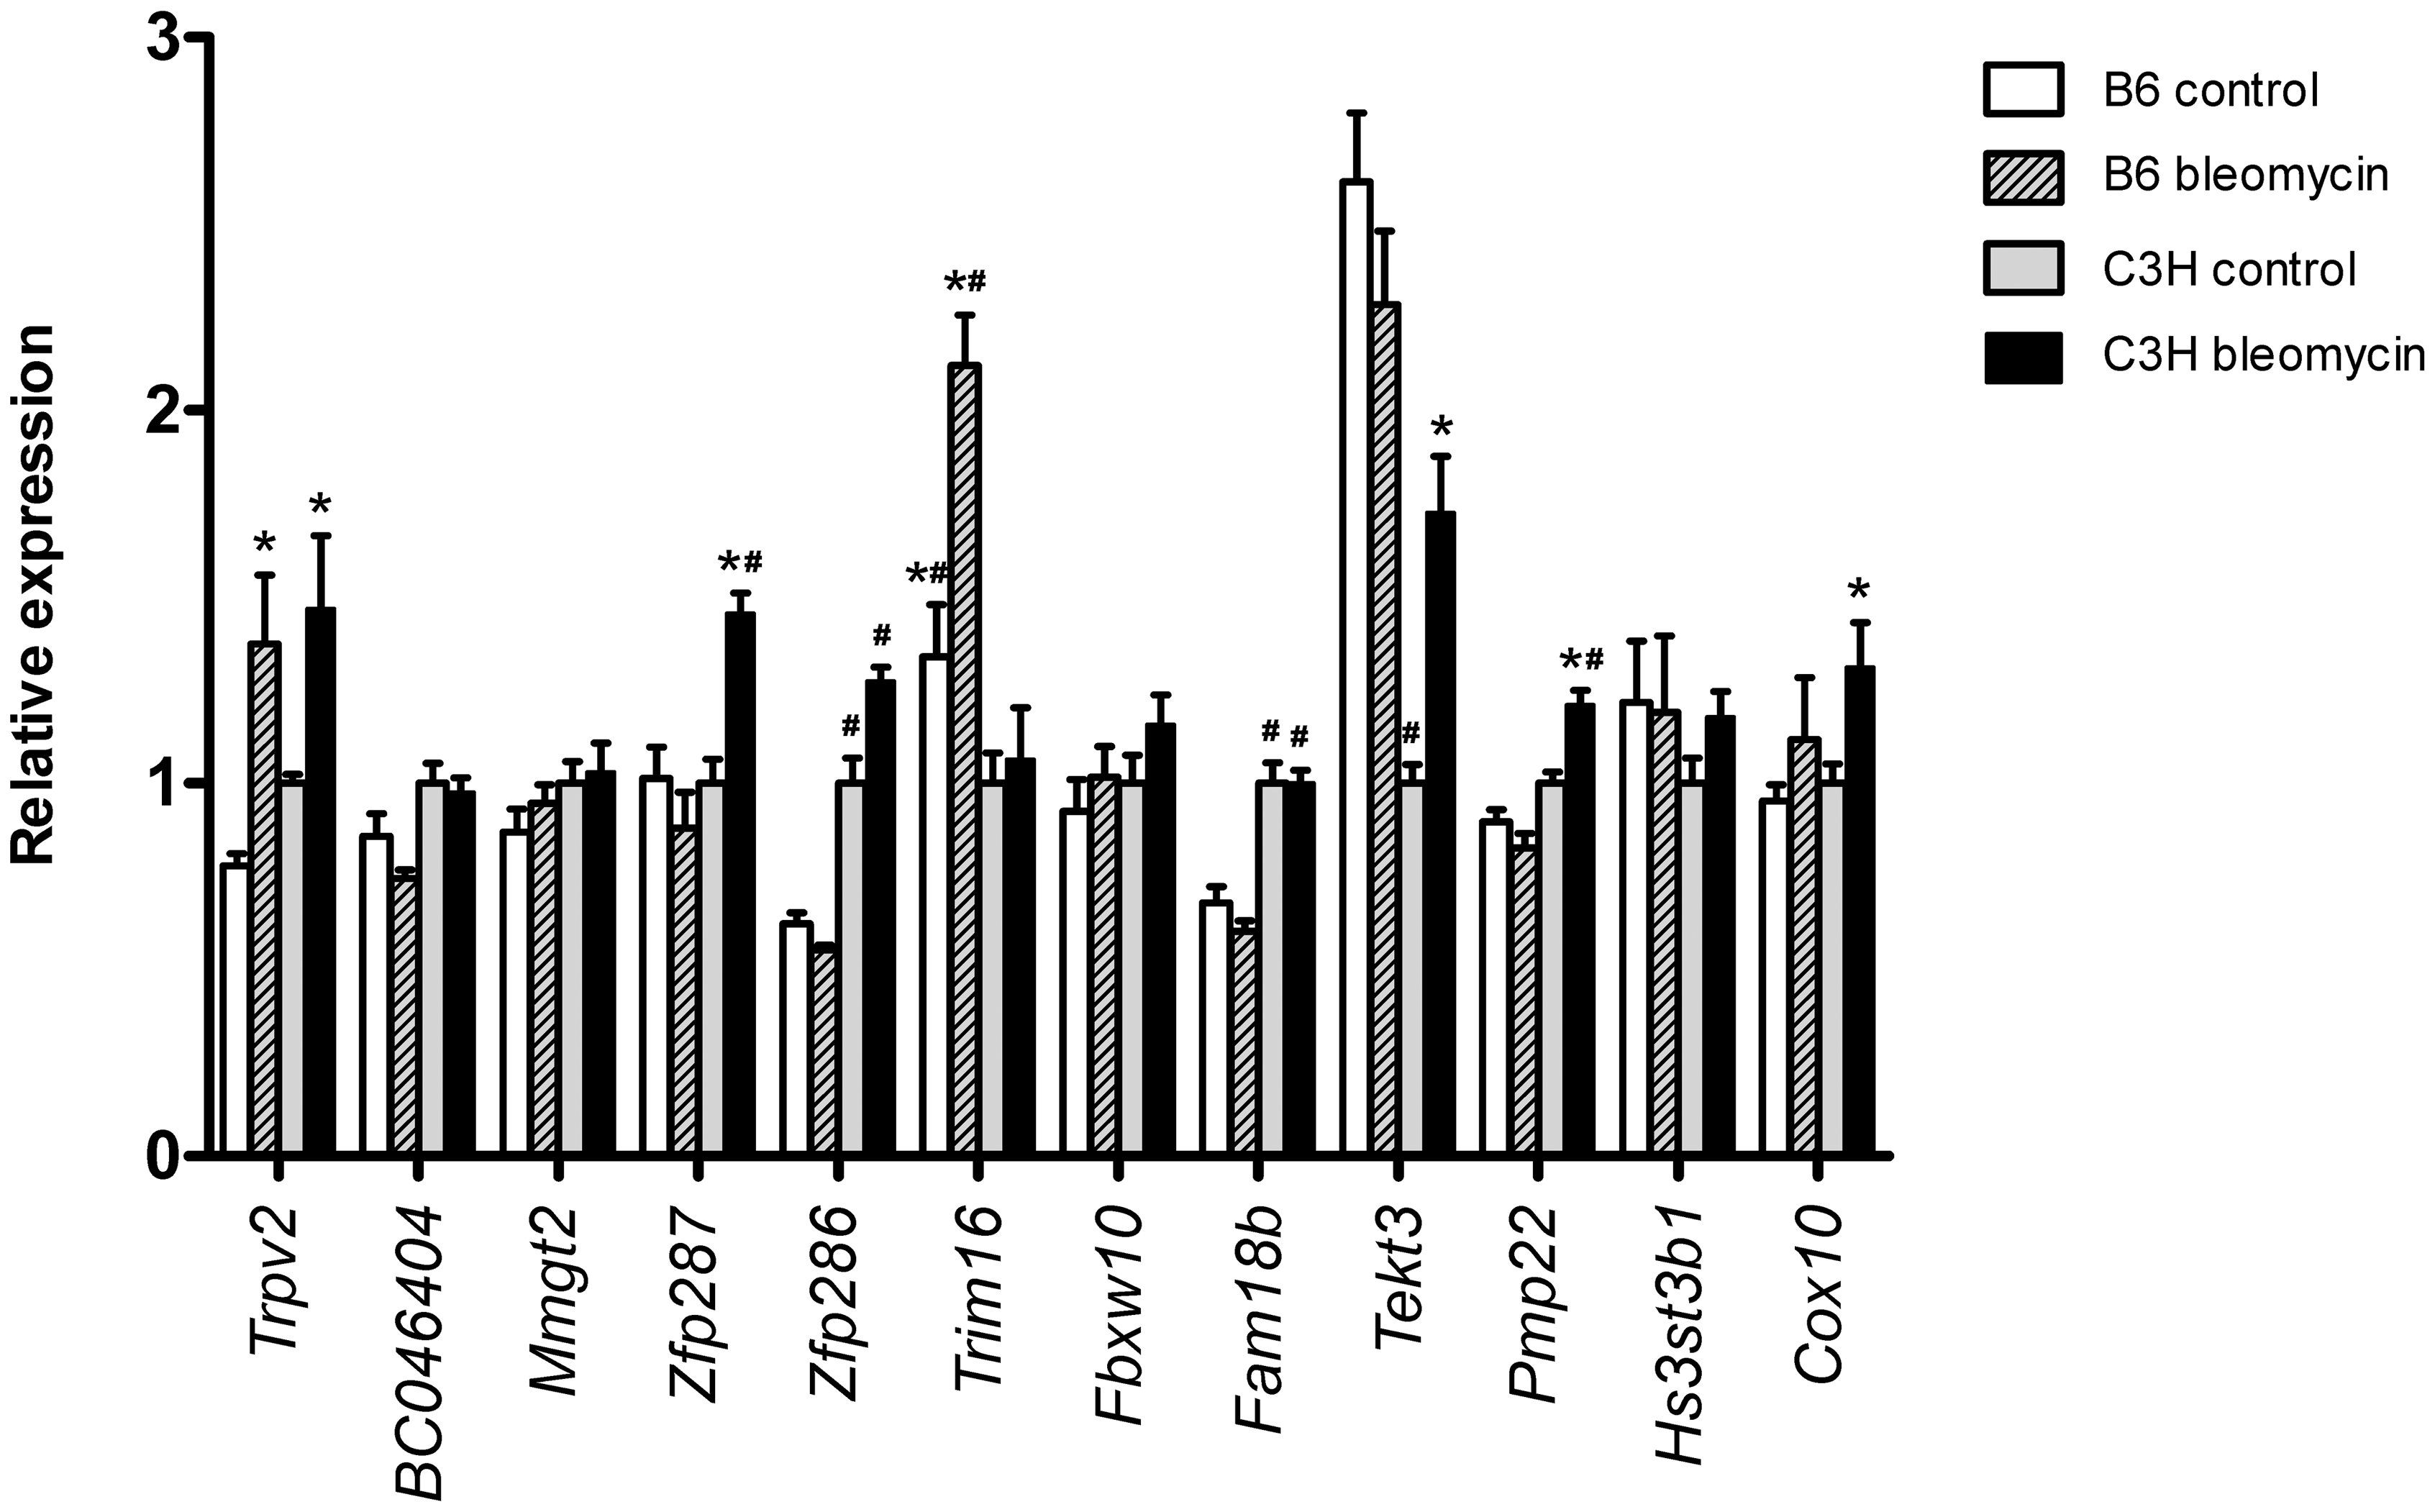 Pulmonary expression of reduced region <i>Blmpf2</i> genes.